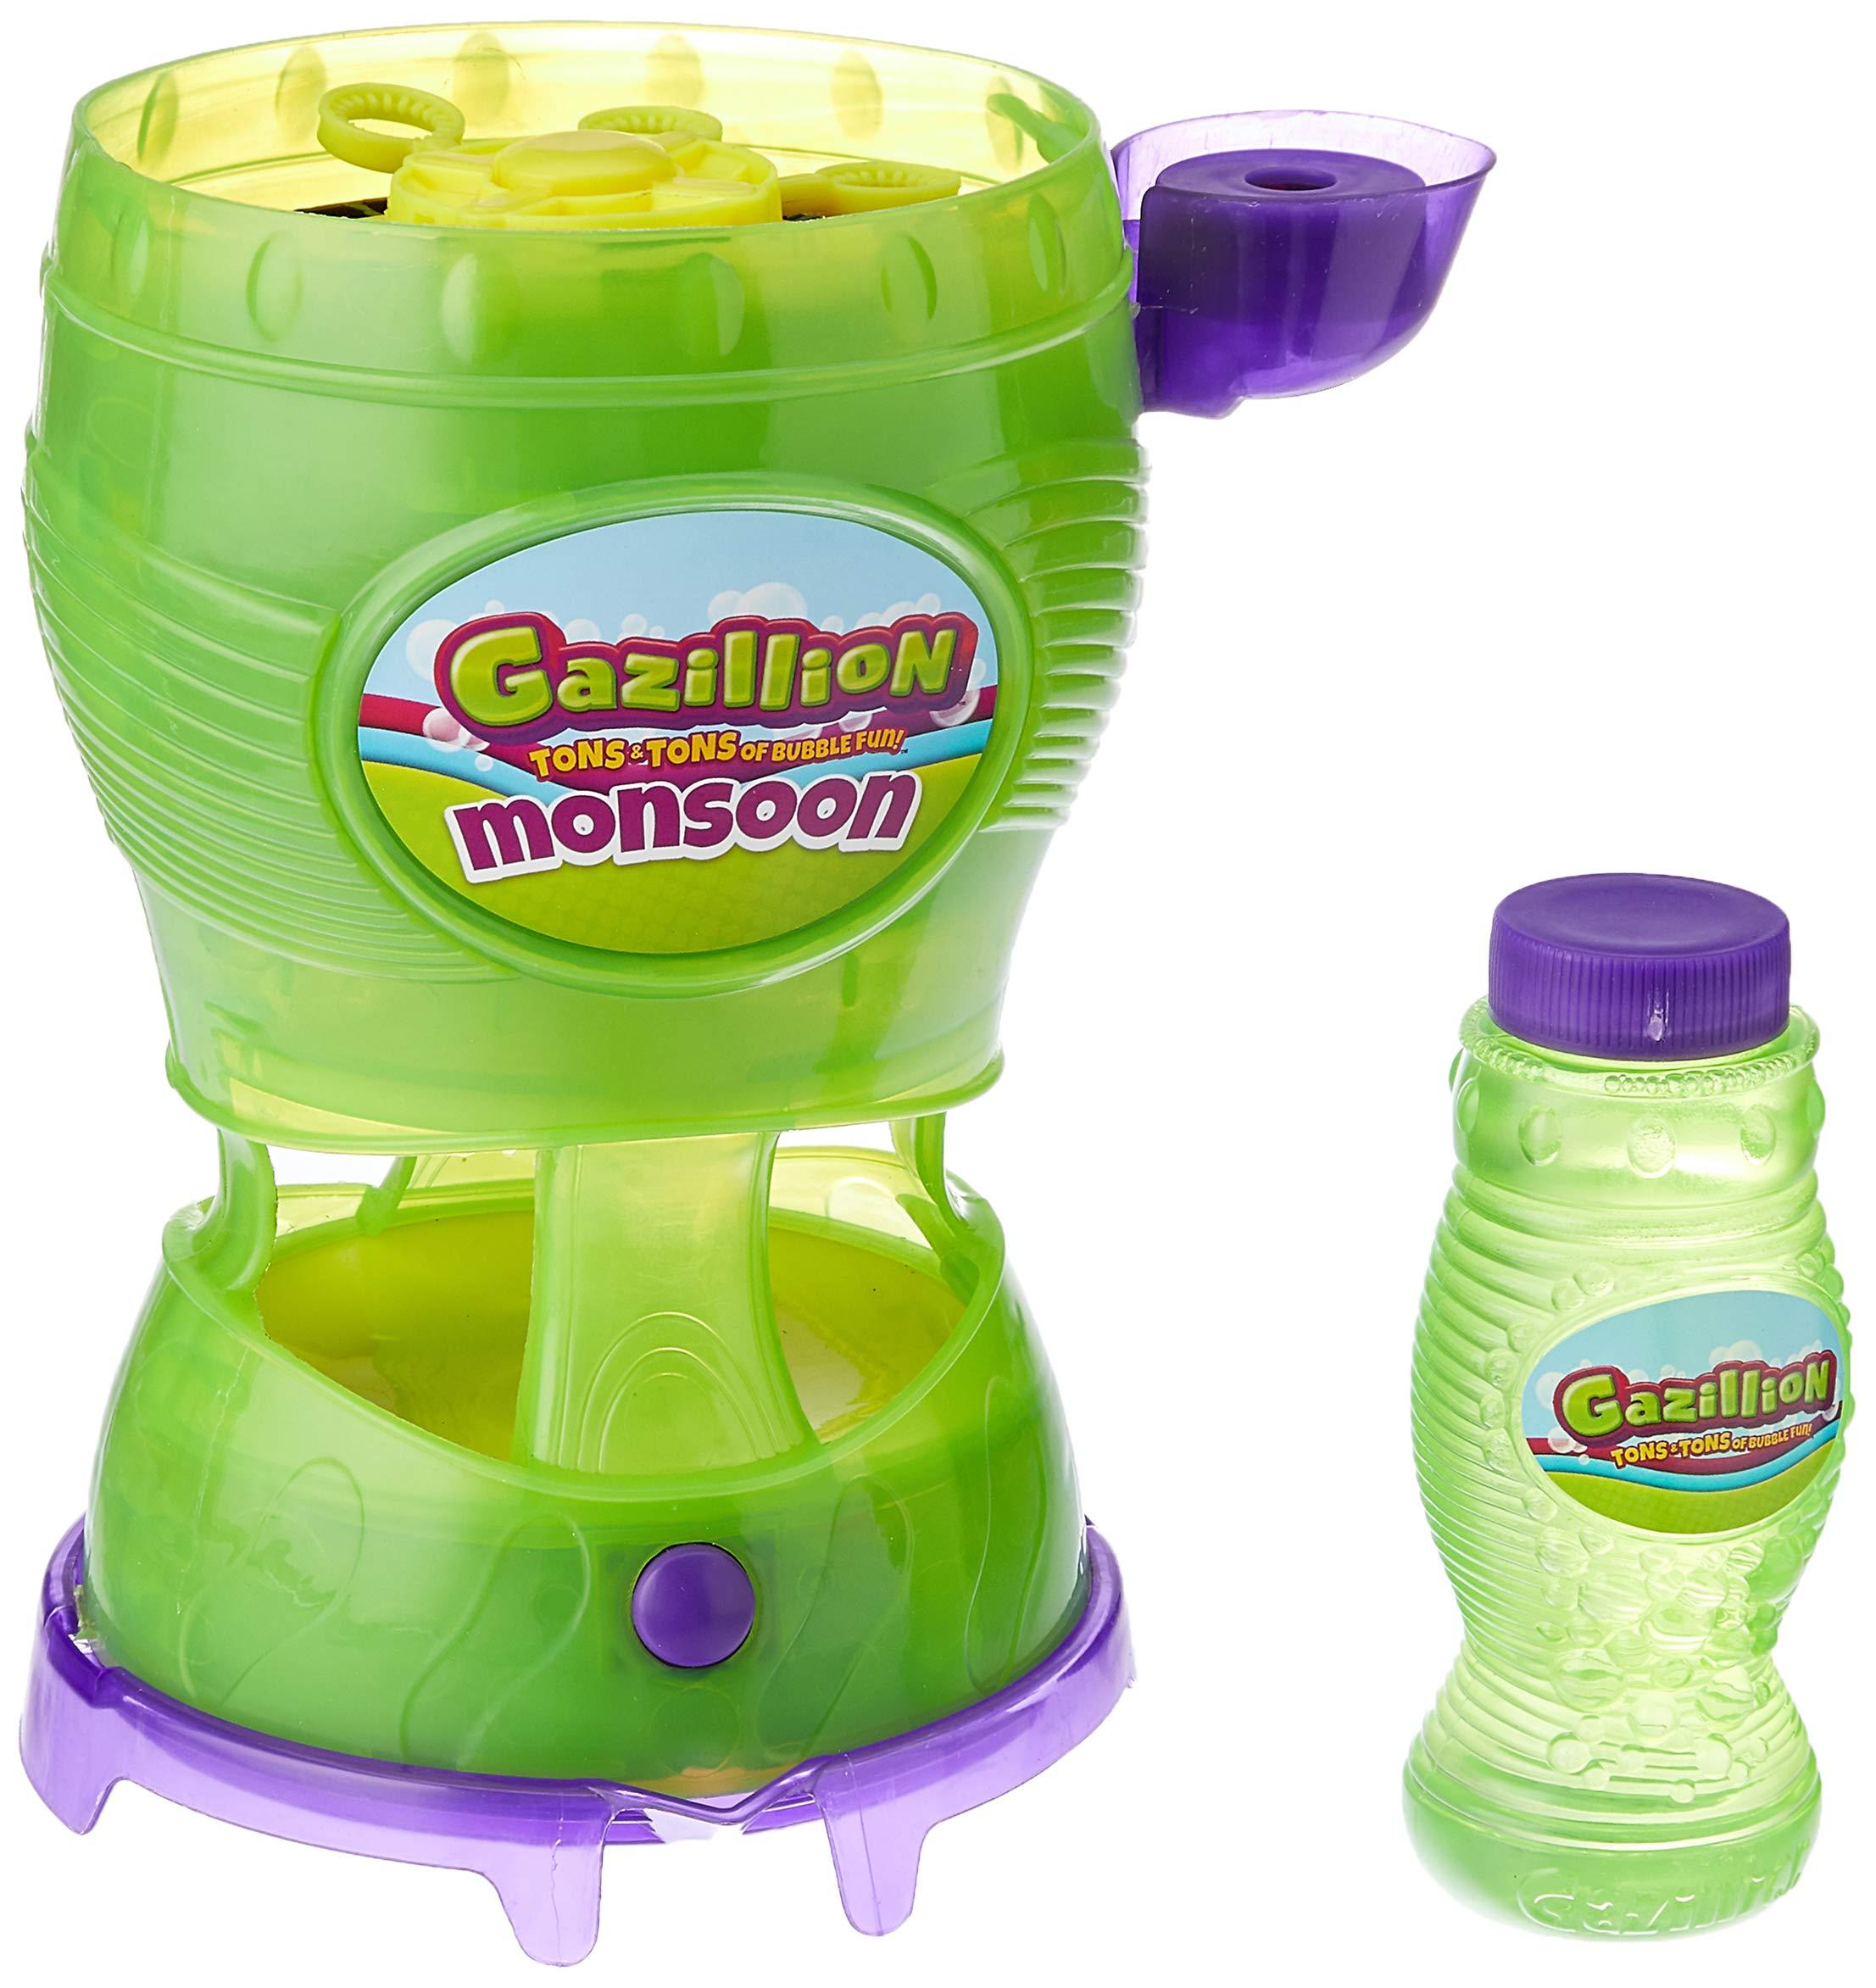 Gazillion Monsoon Toy, Blue/Green